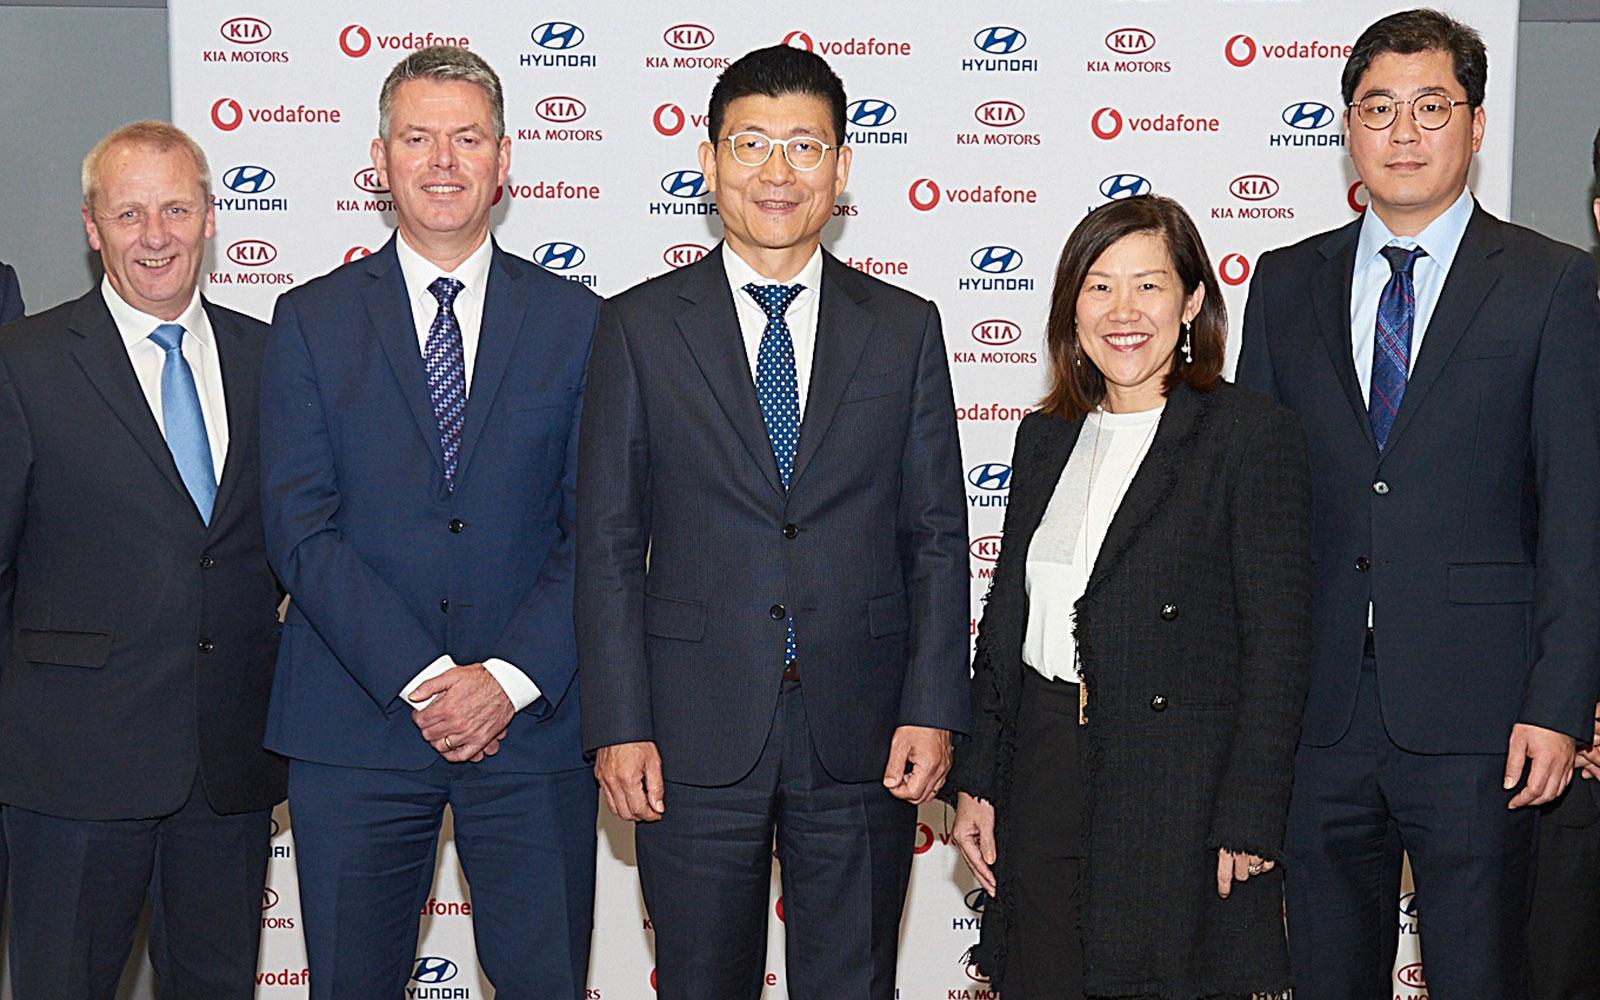 Hyundai & Kia Partner w/ Vodafone for Future IT Systems